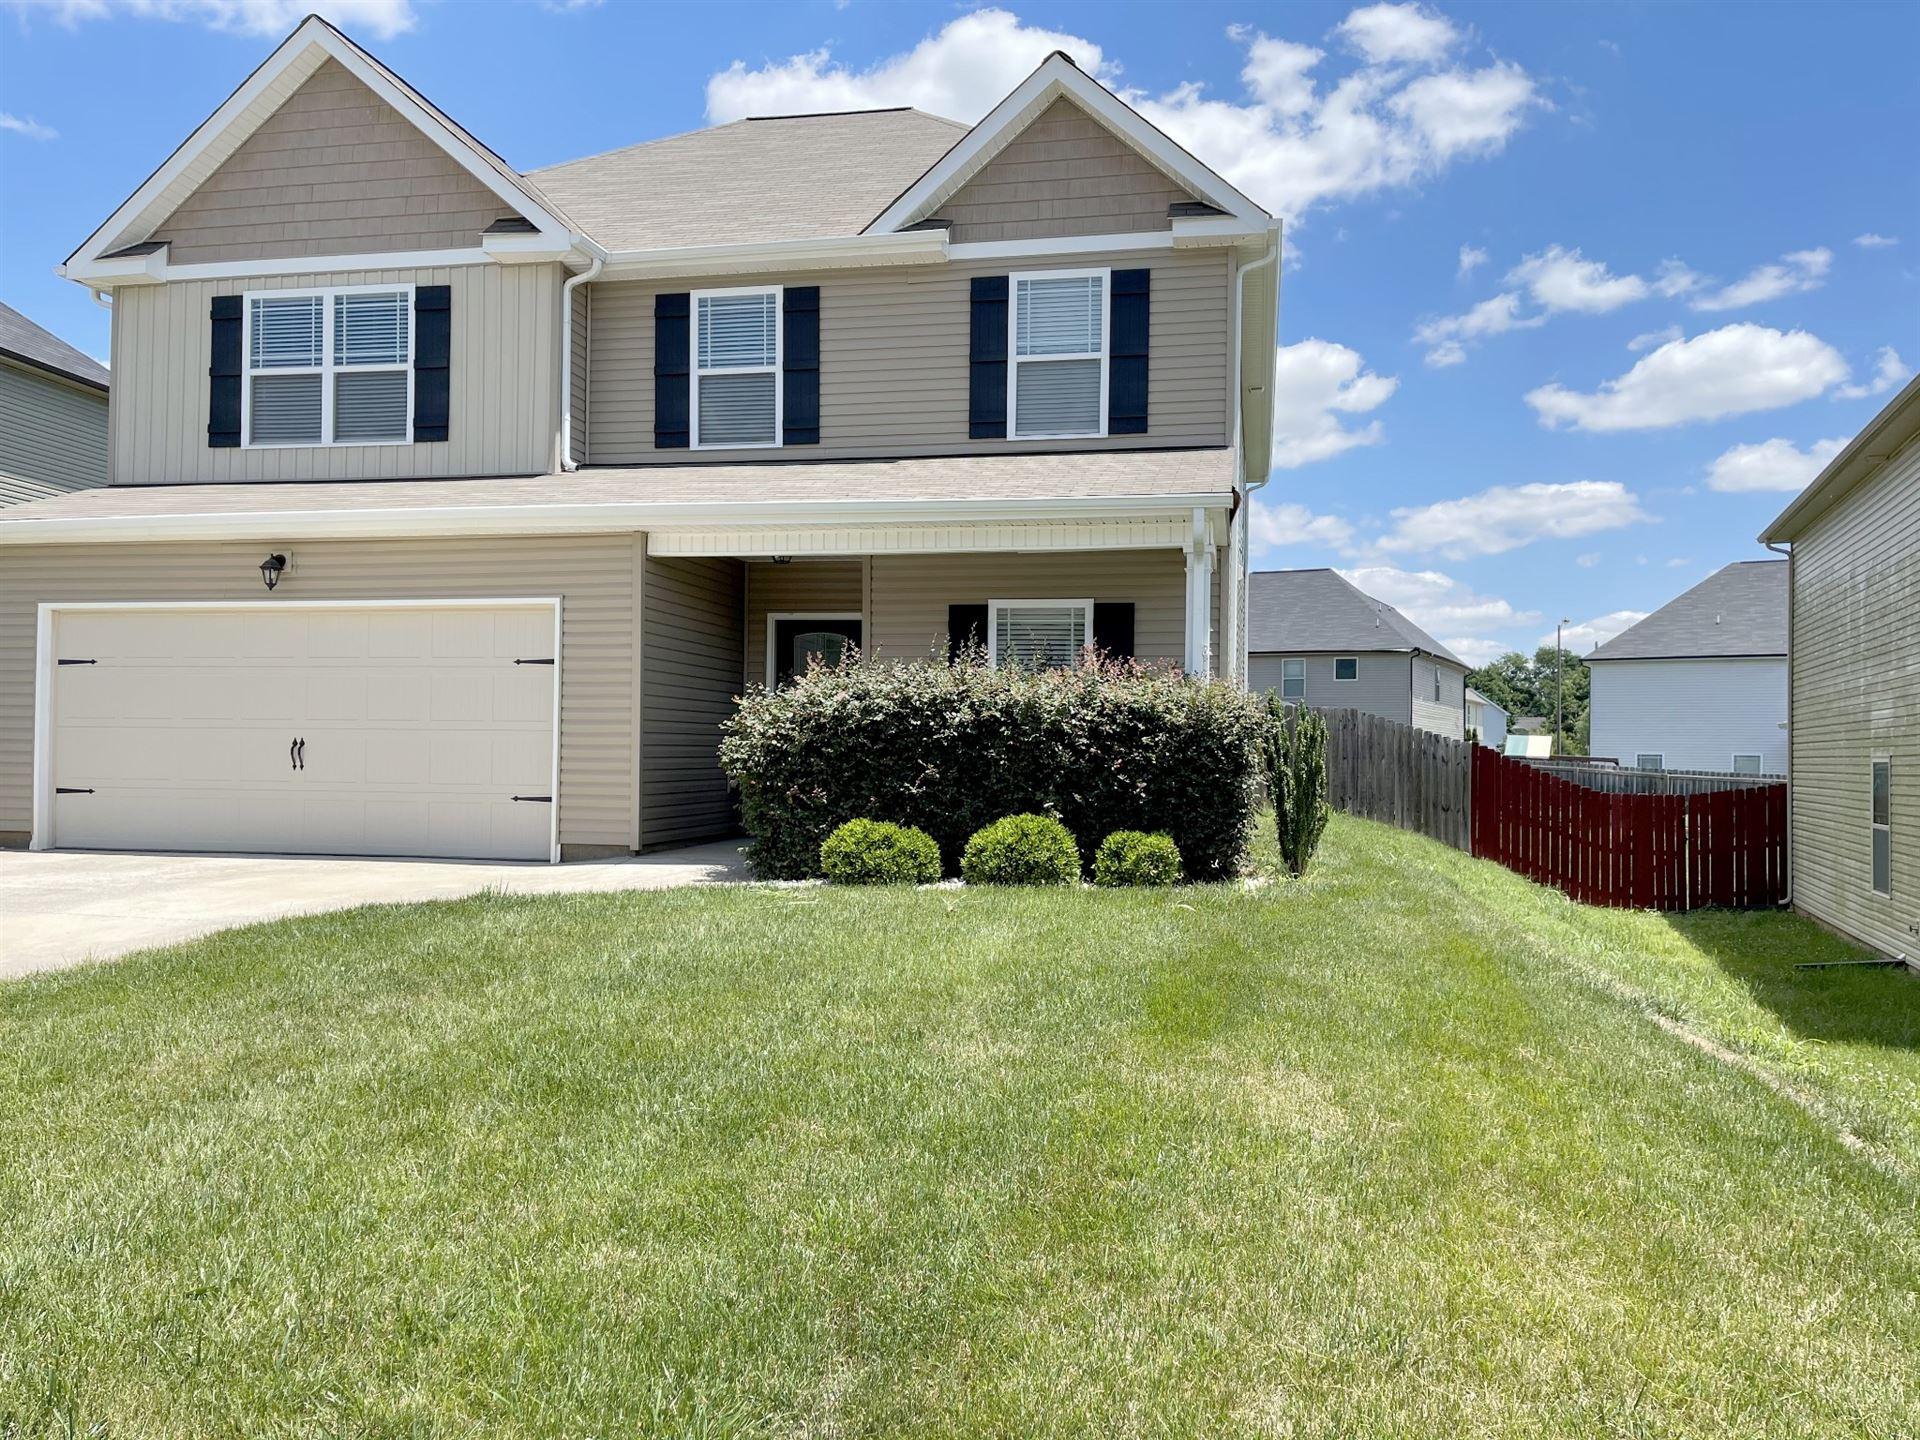 3340 N Henderson Way, Clarksville, TN 37042 - MLS#: 2265756